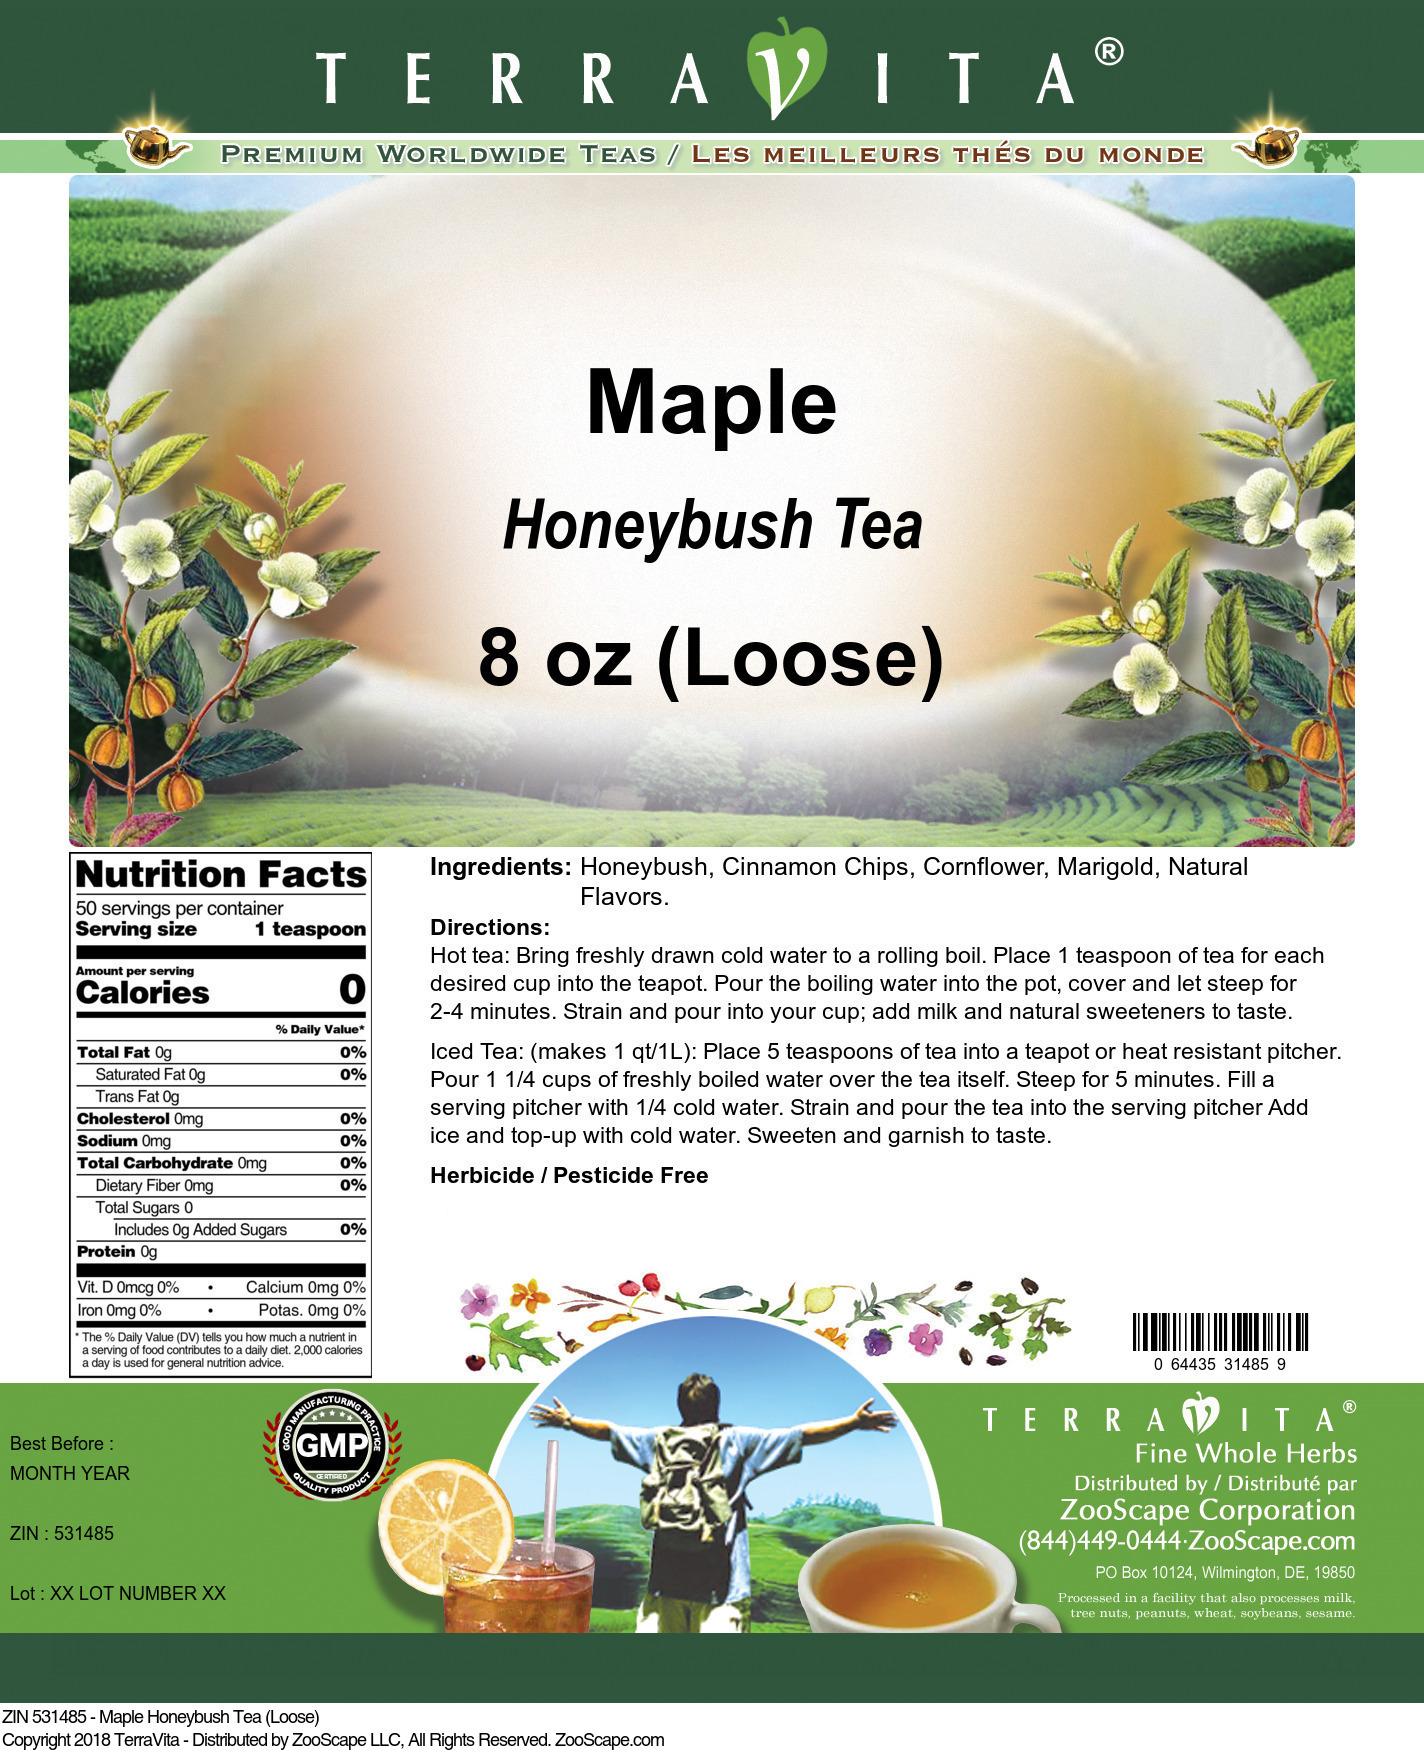 Maple Honeybush Tea